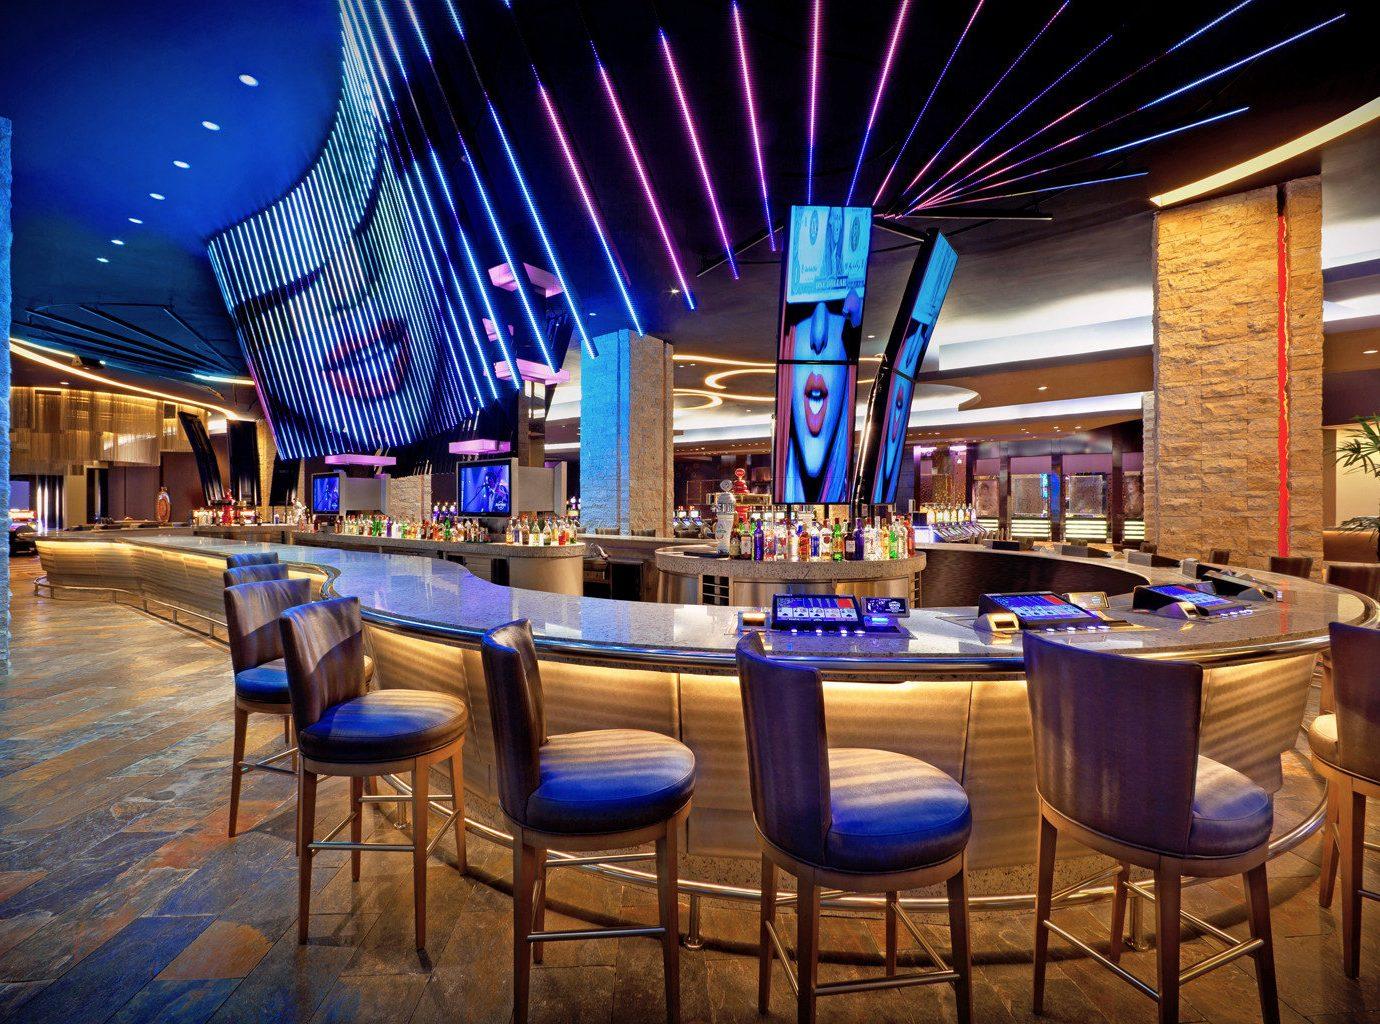 Bar at Hard Rock Hotel & Casino Punta Cana, Dominican Republic